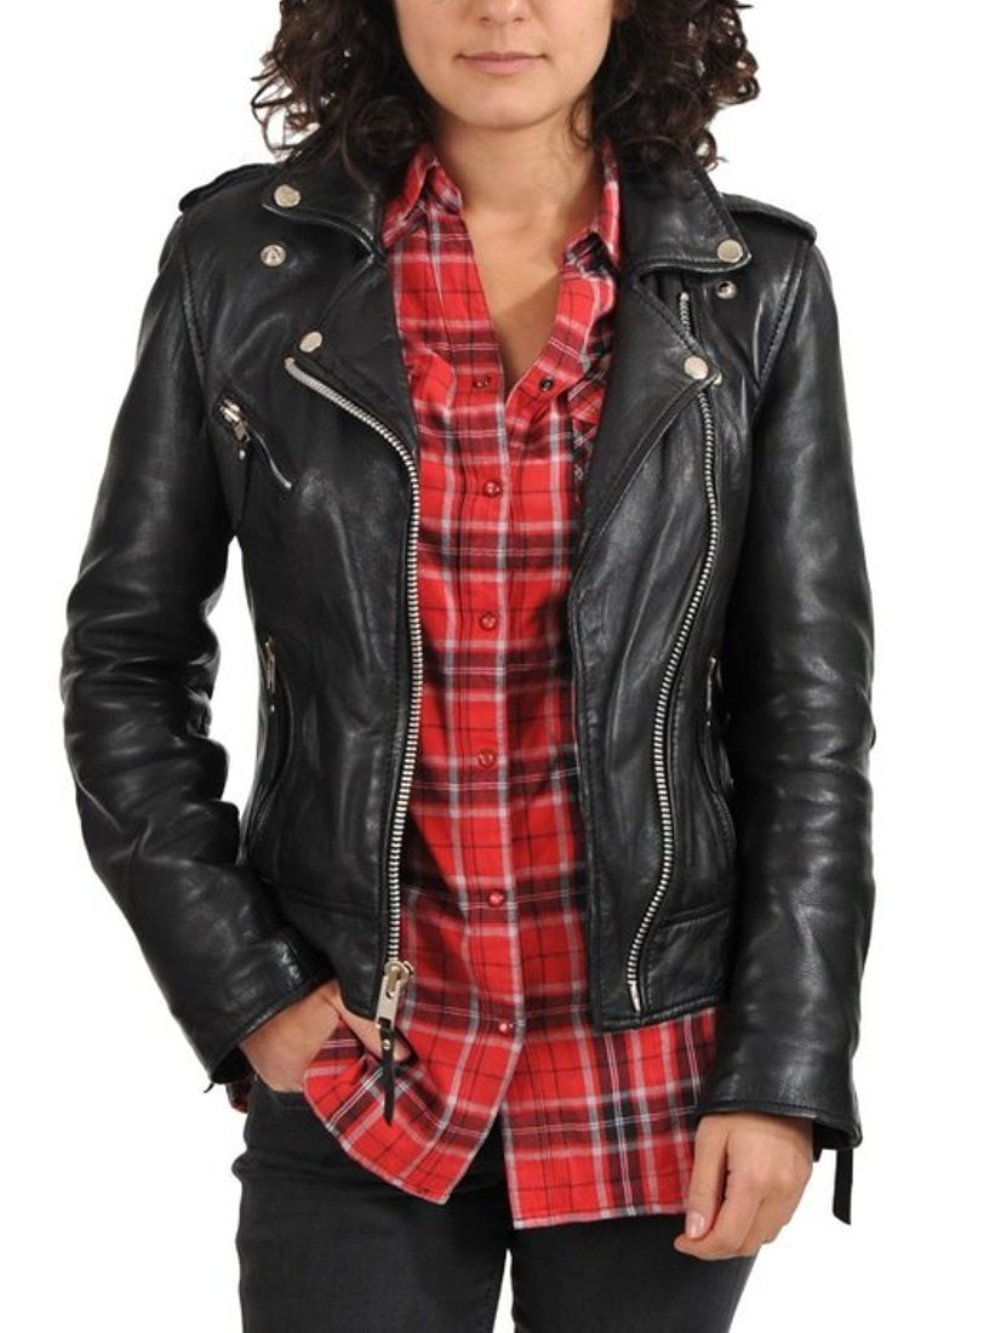 World Of Leather Women's Biker Moto Leather Jacket (S)